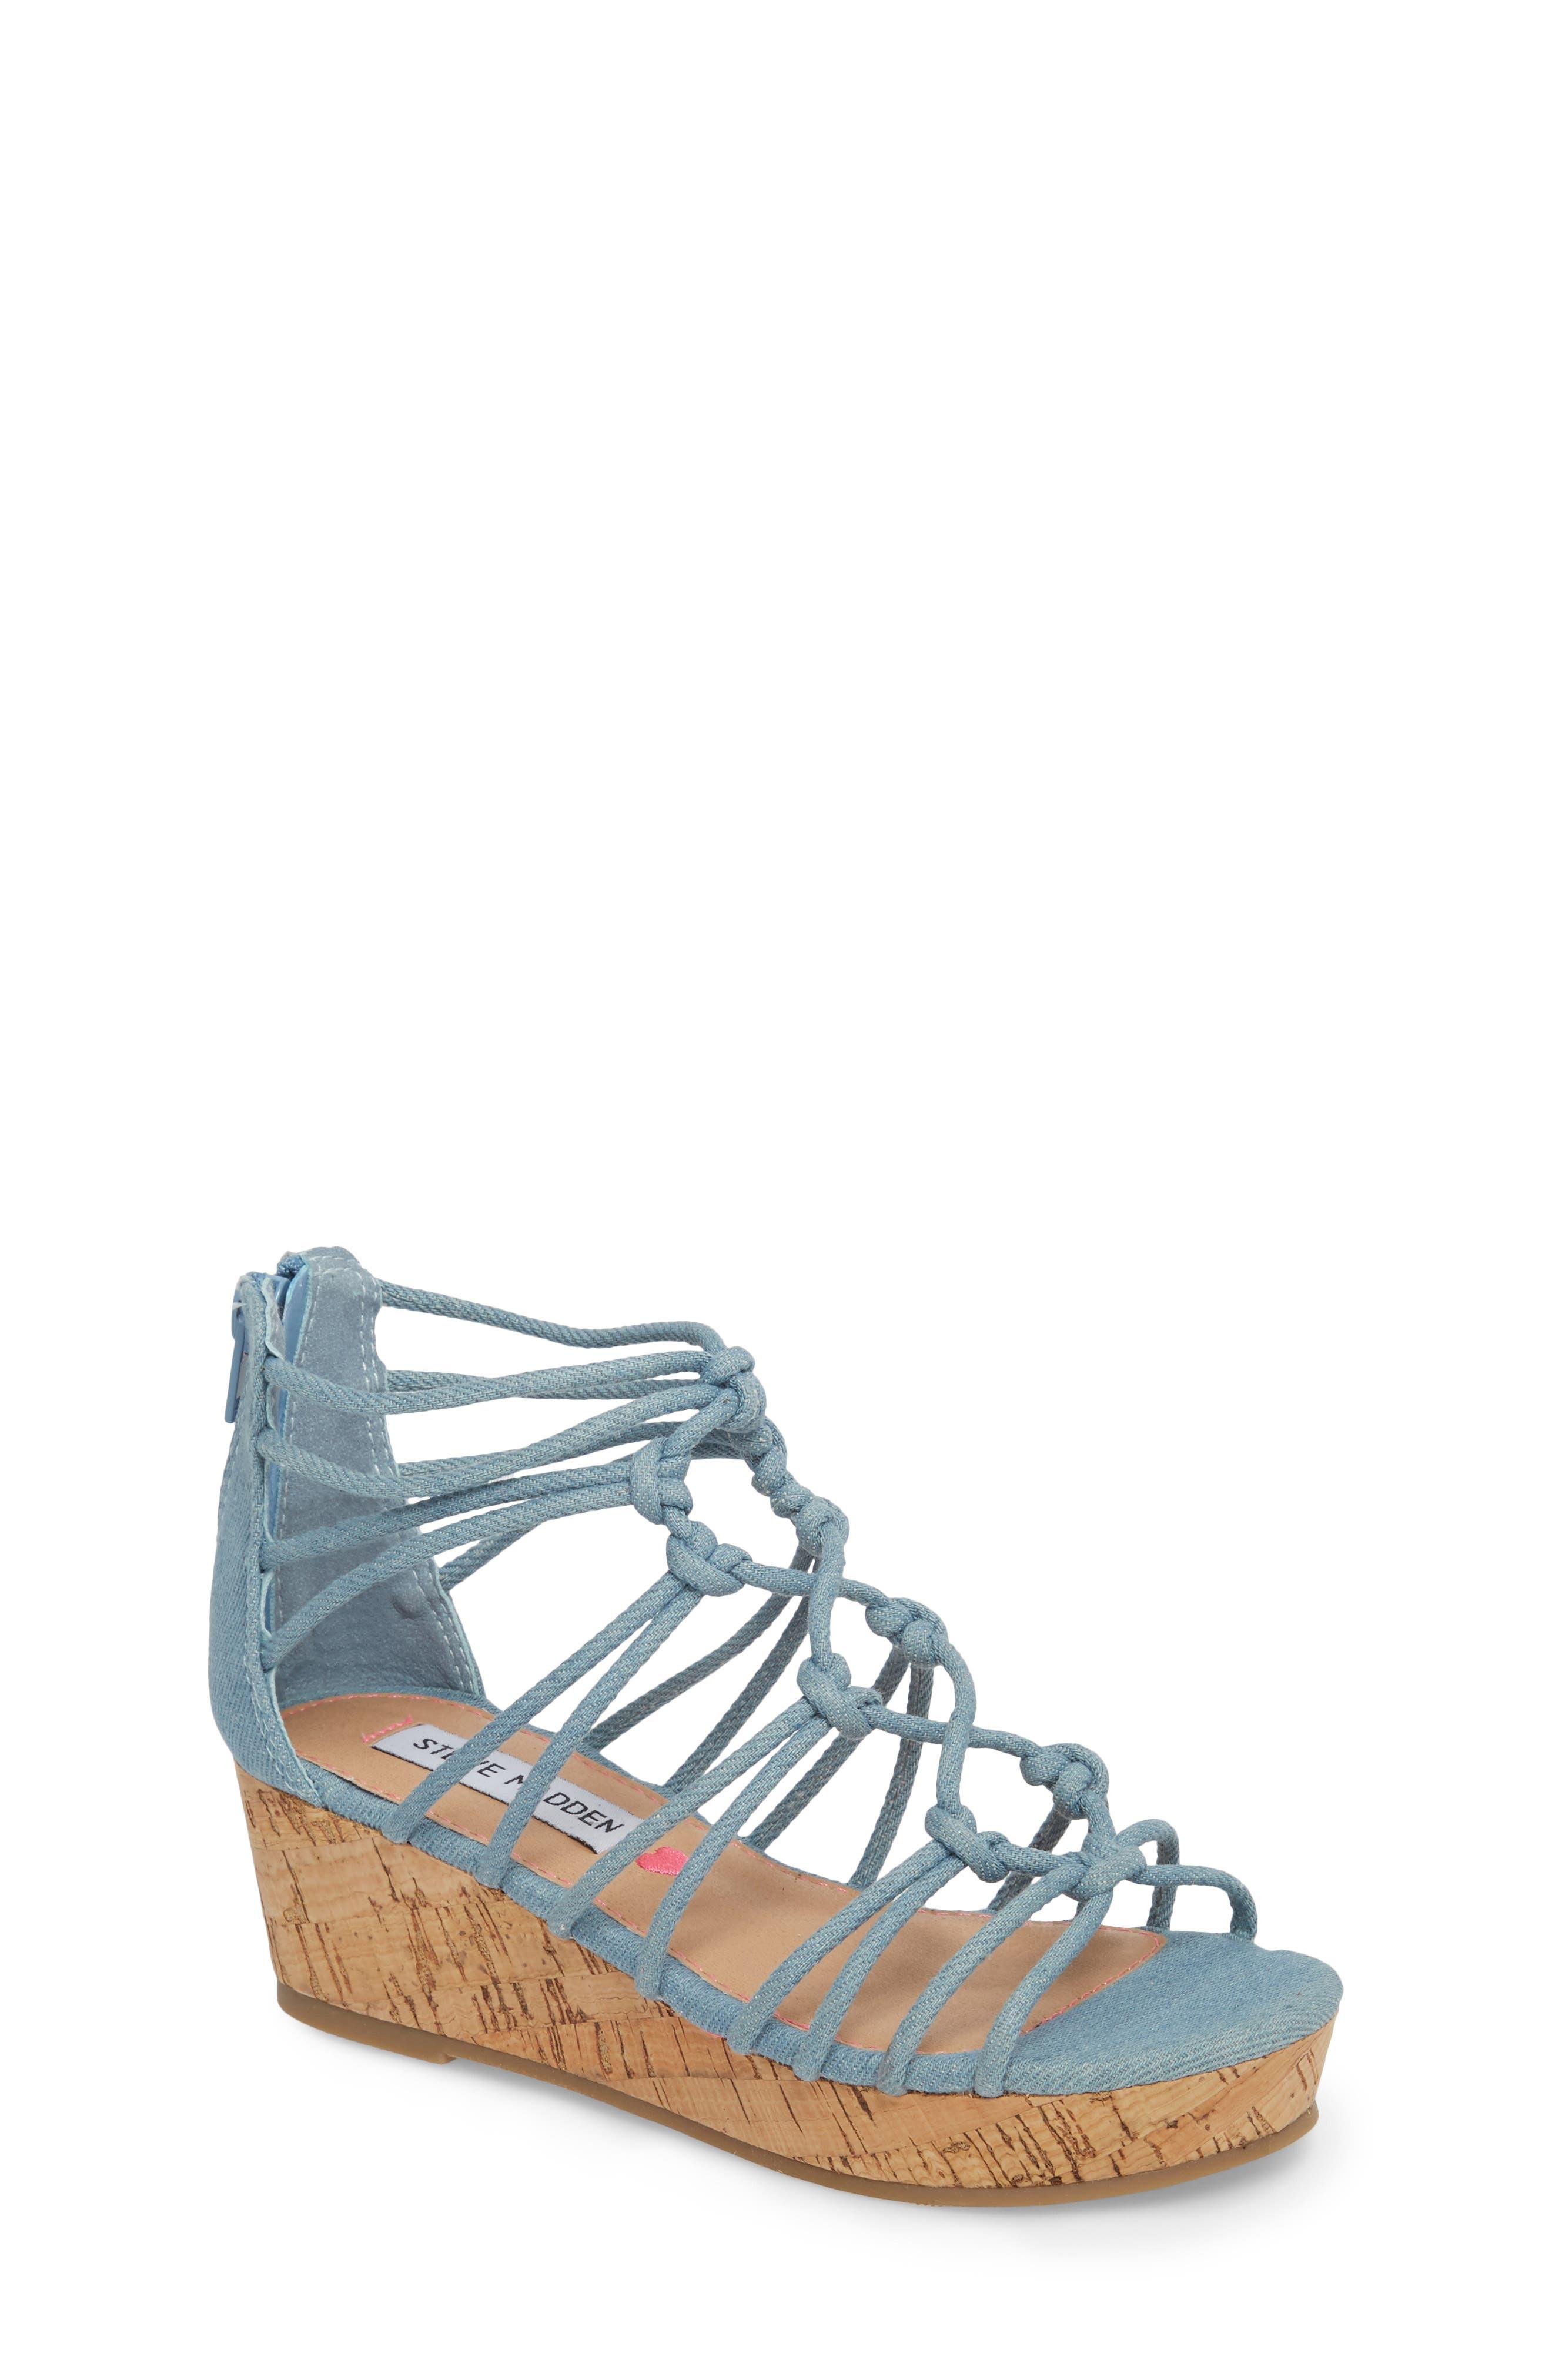 Wistfull Wedge Sandal,                         Main,                         color, 400